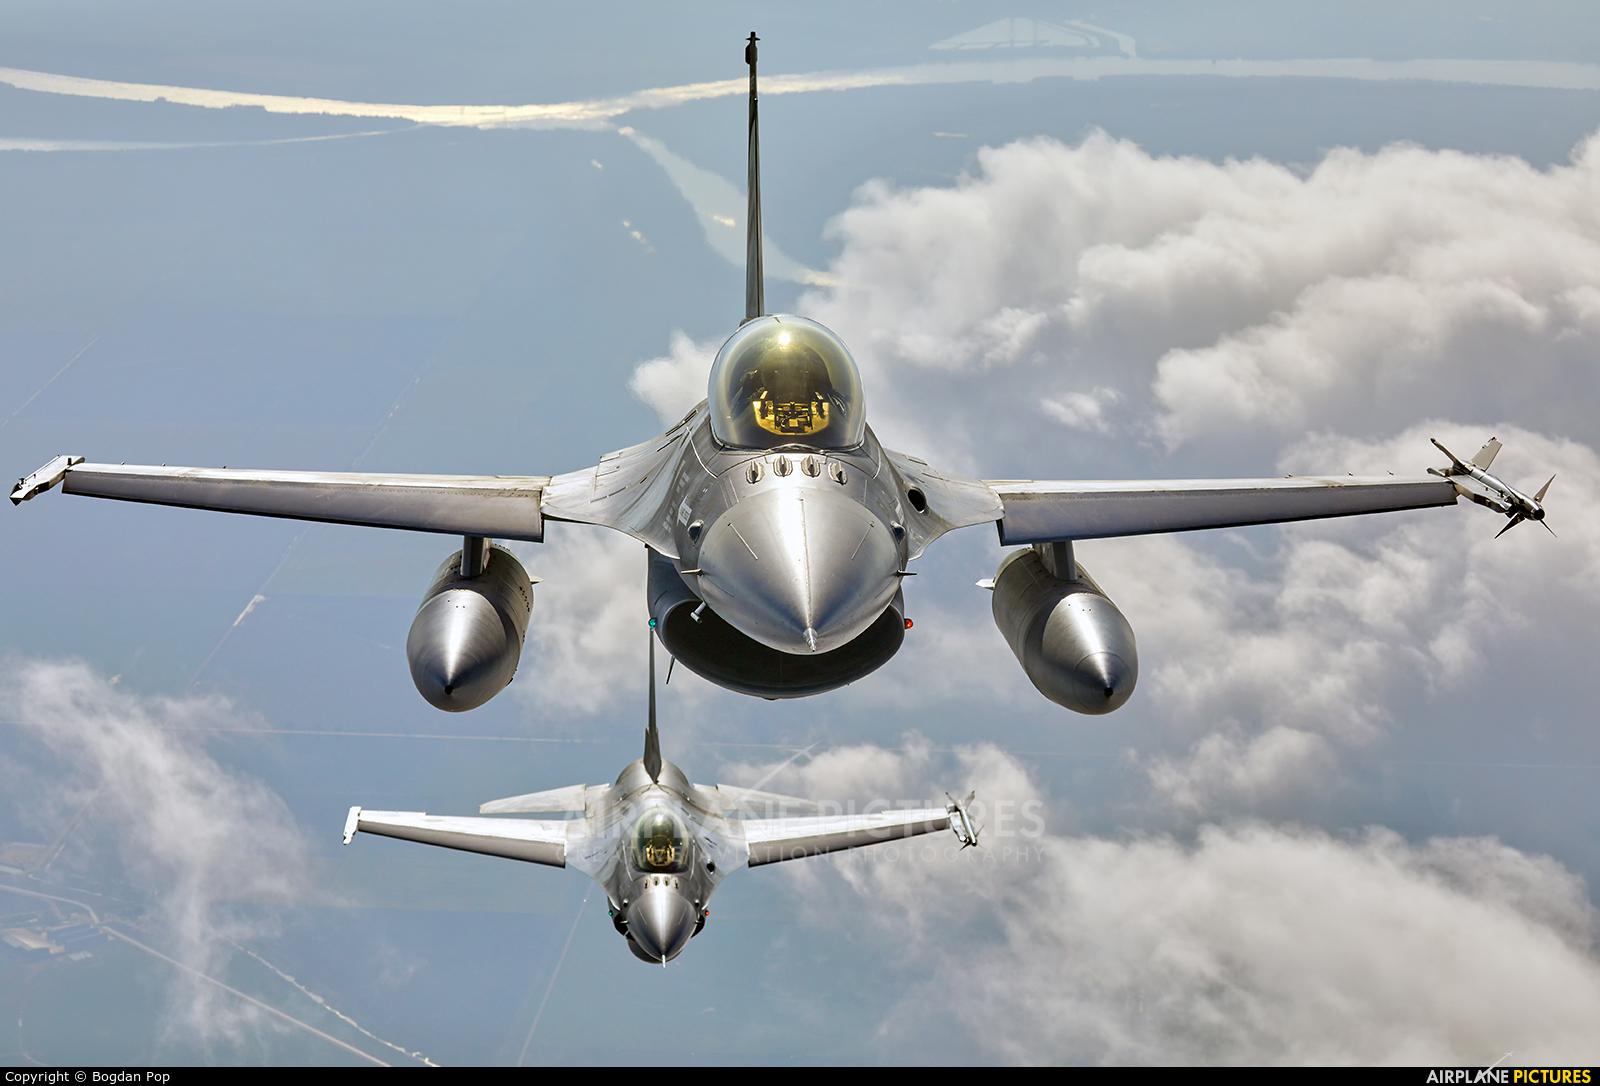 Romania - Air Force 1611 aircraft at In Flight - Romania